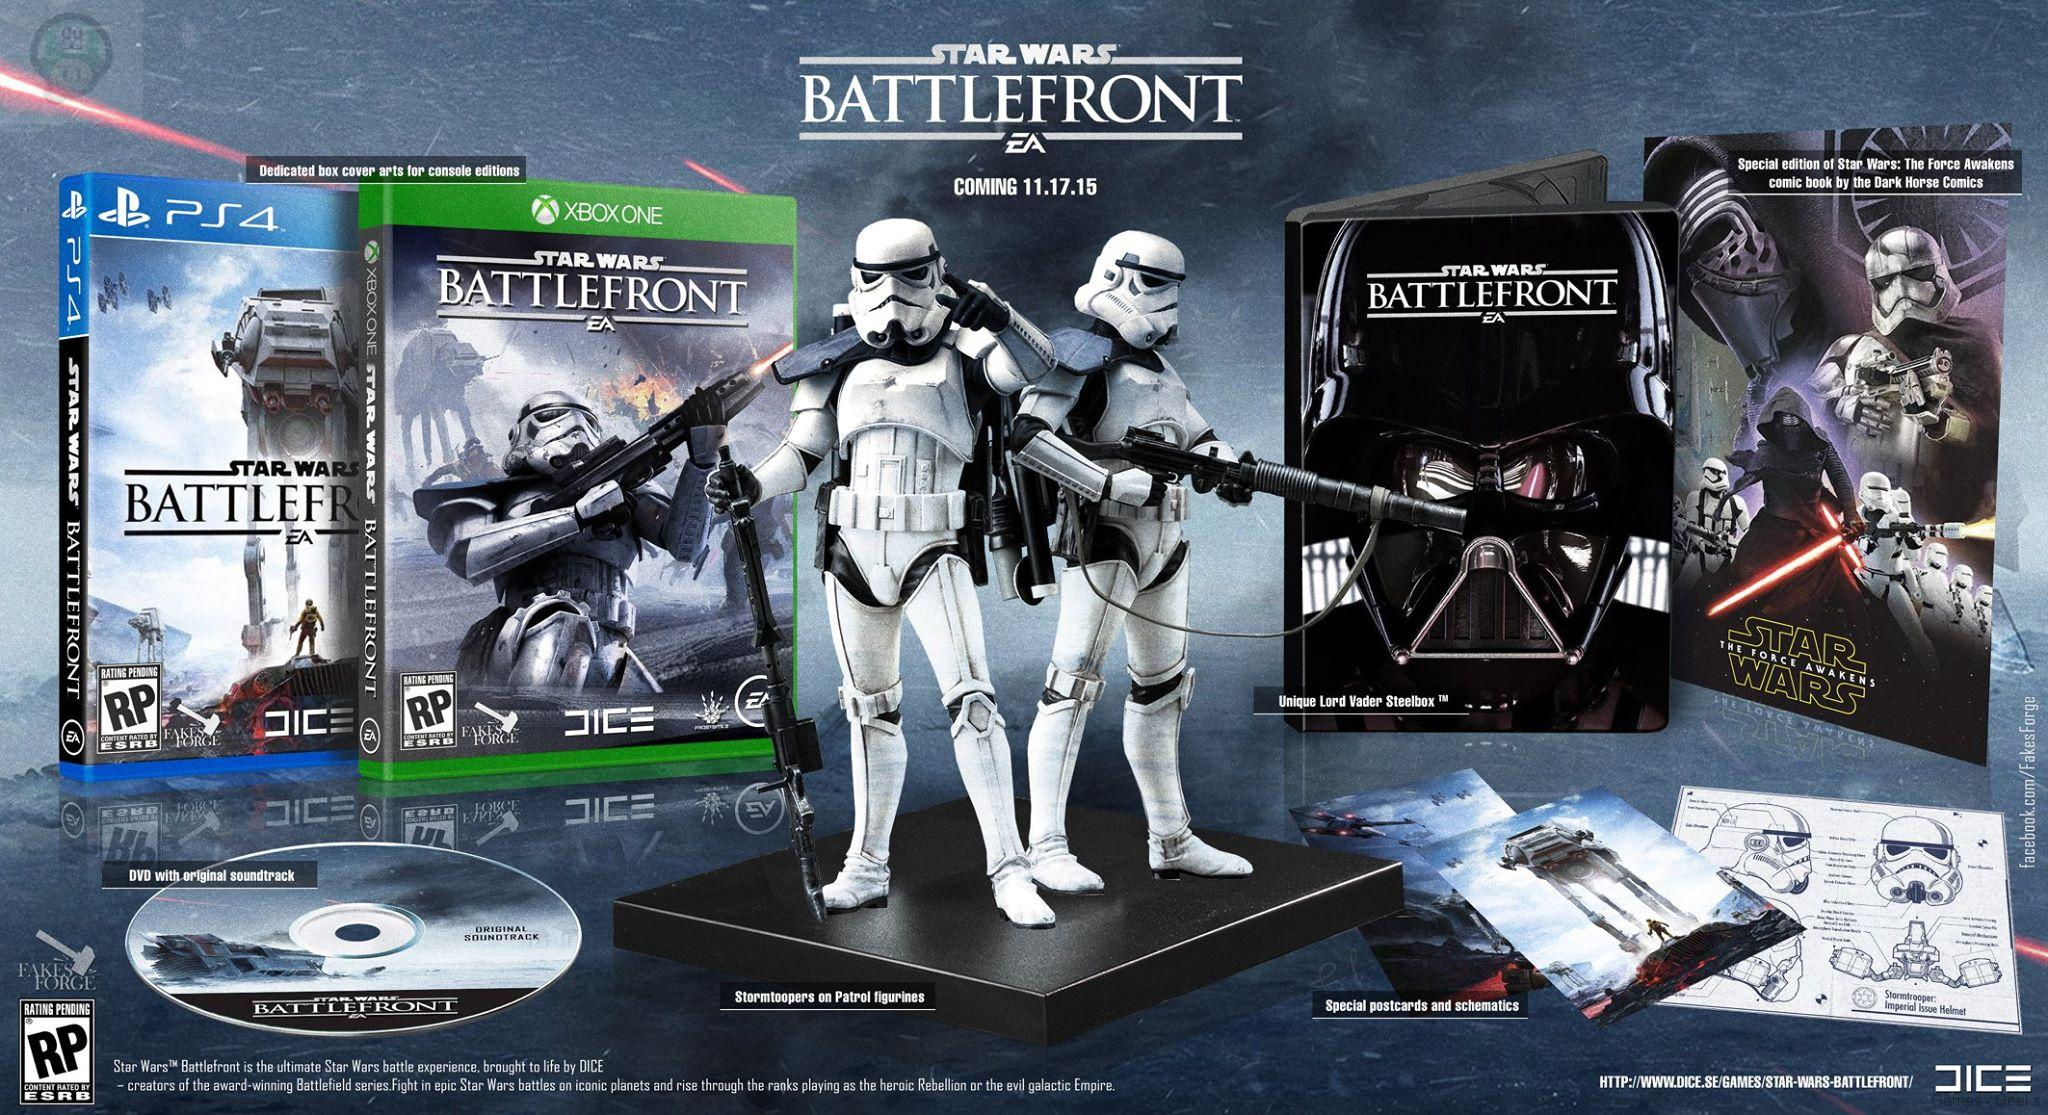 Figurine Star Wars Battlefront Videogame Masterpiece Shock Trooper 30cm